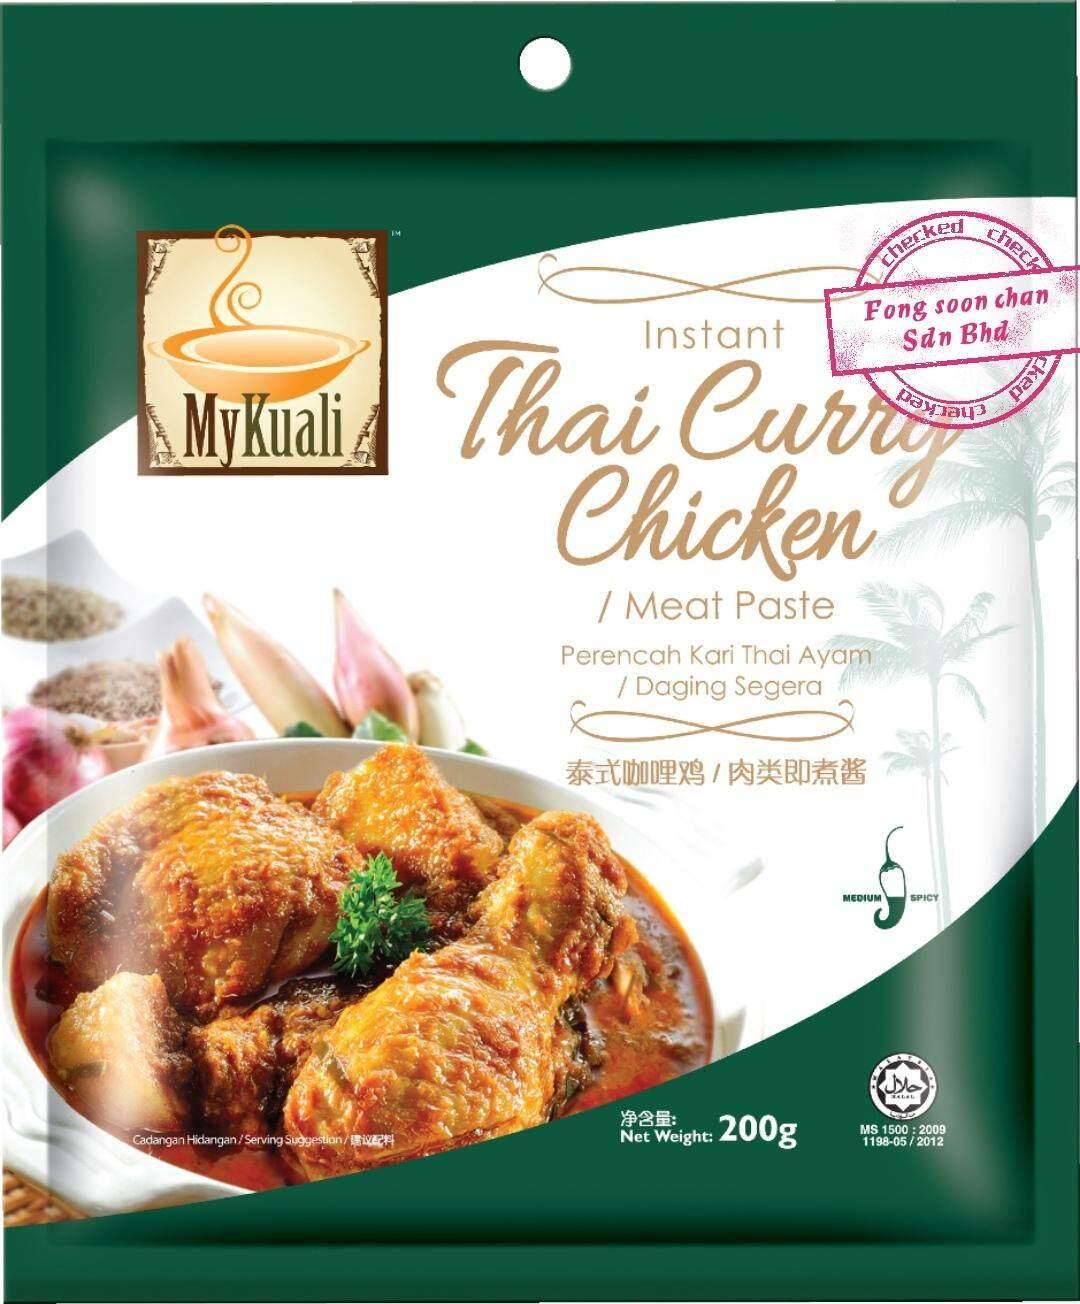 [FSC] Mykuali Instant Thai Curry Chicken 200gm